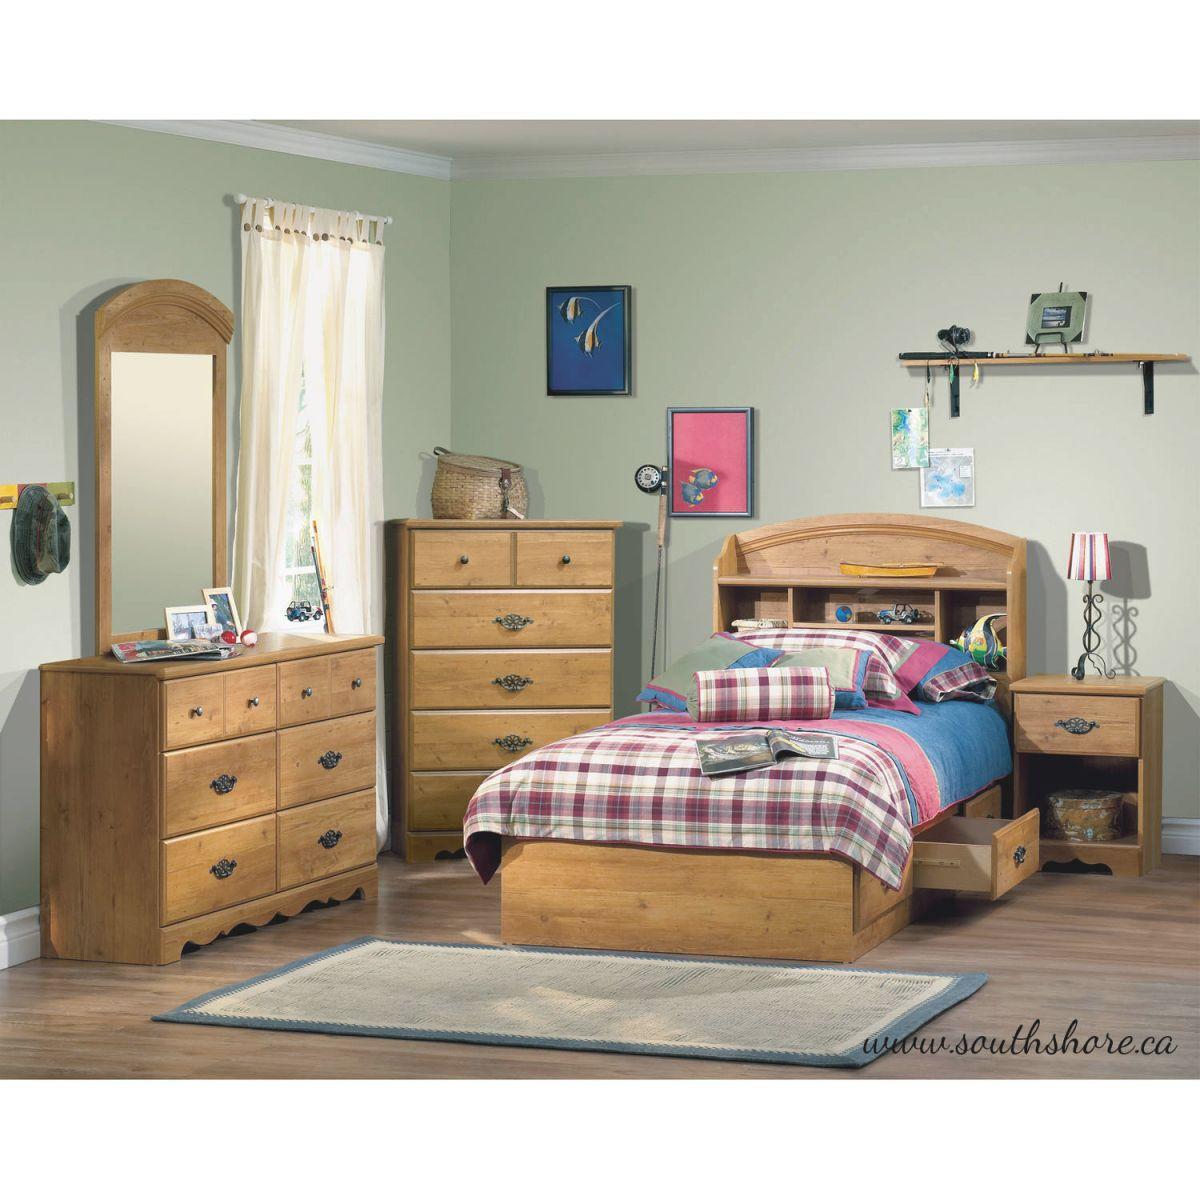 South Shore Prairie Bedroom Furniture Collection – Walmart regarding Lovely Boys Bedroom Furniture Sets